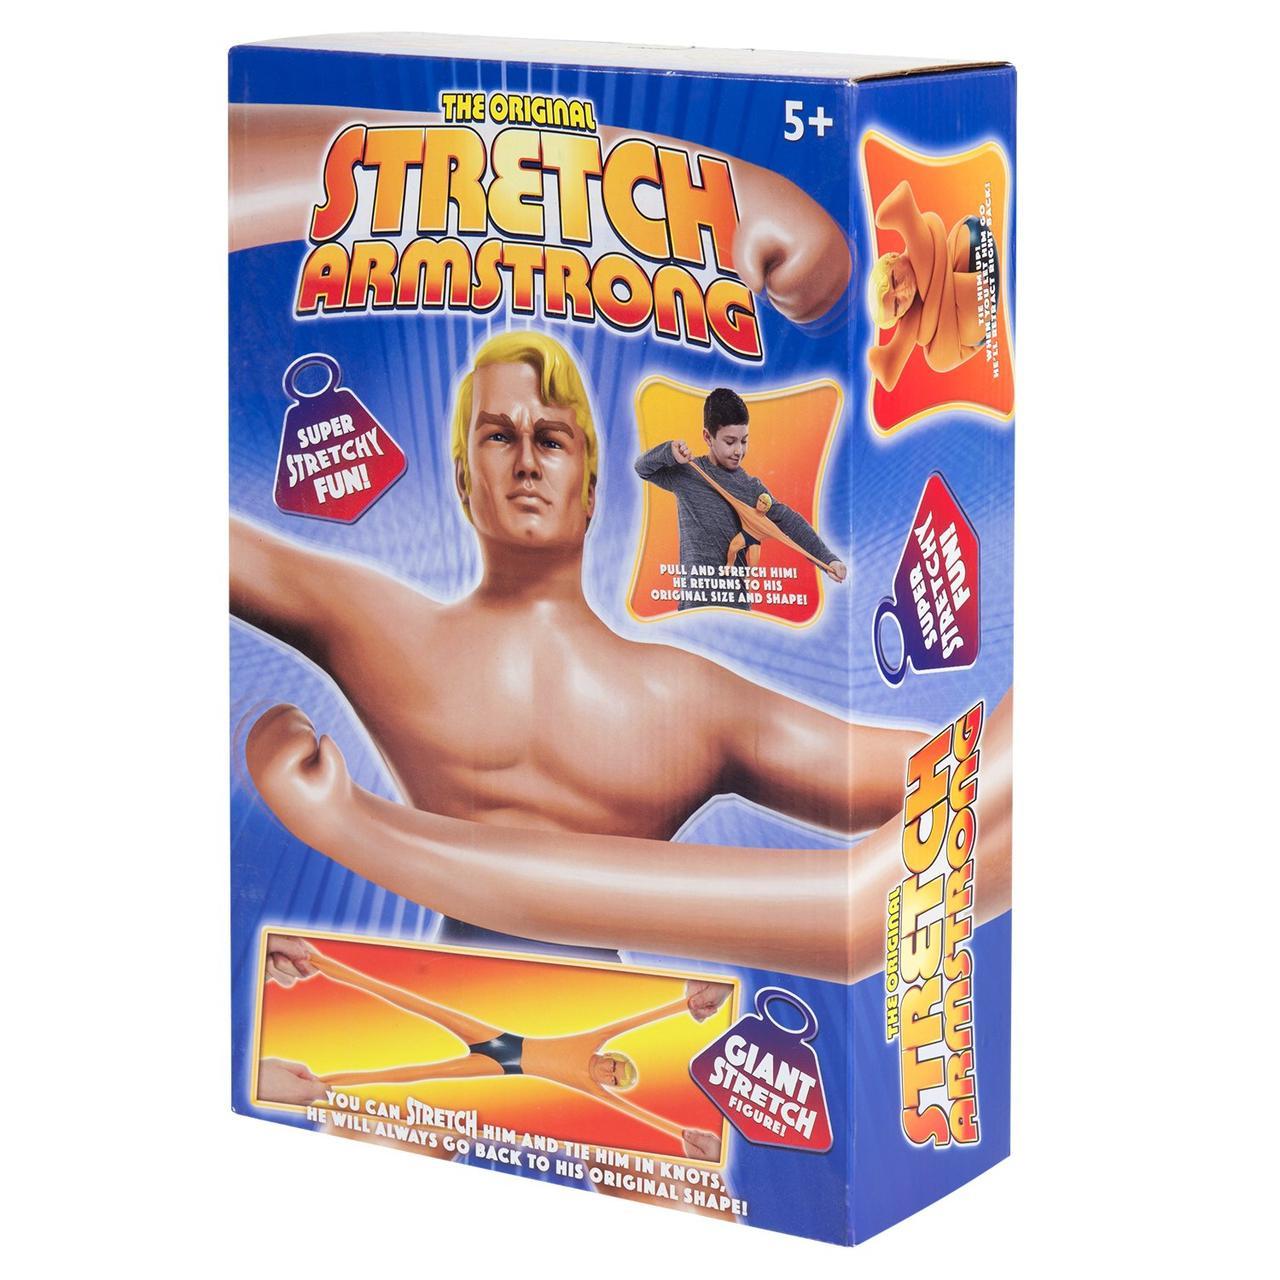 Stretch Тянущаяся фигурка Армстронг Стретч, 30 см.